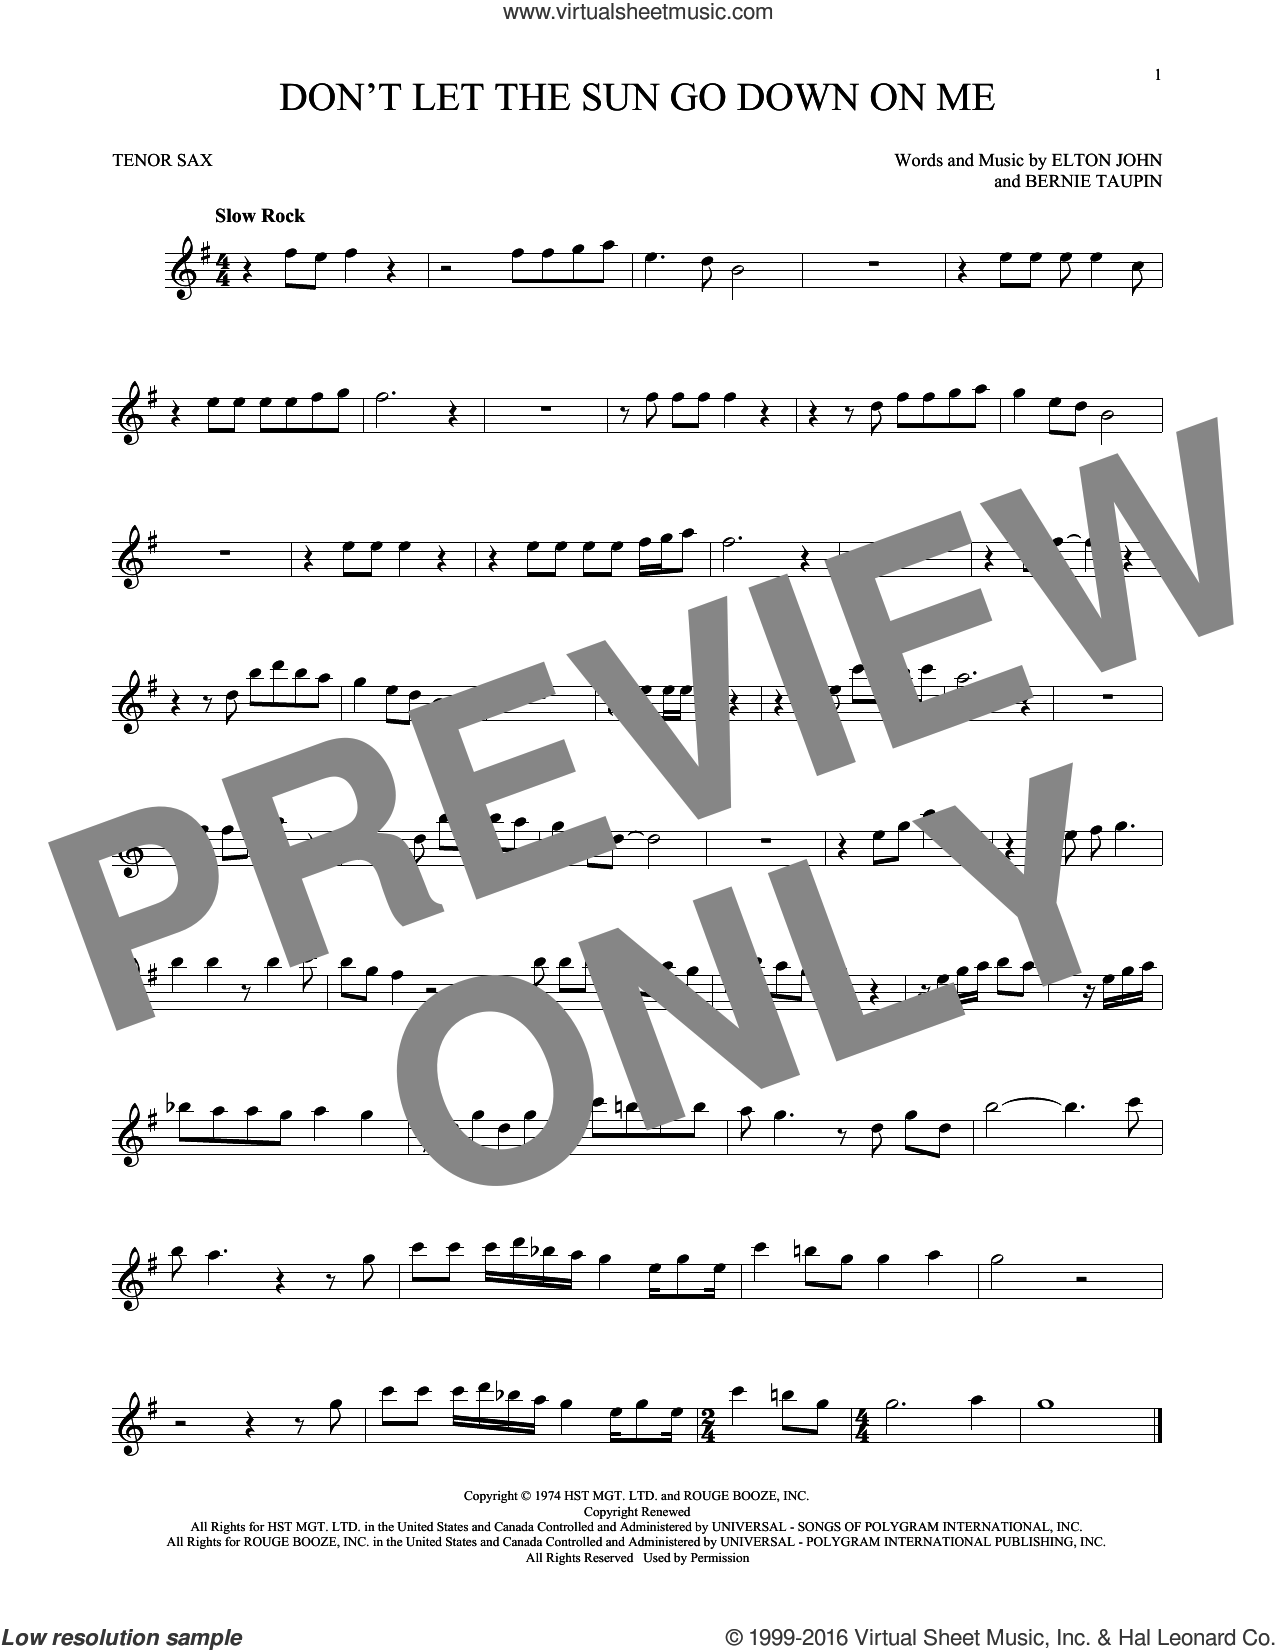 Don't Let The Sun Go Down On Me sheet music for tenor saxophone solo by Elton John & George Michael, David Archuleta, Bernie Taupin and Elton John, intermediate skill level